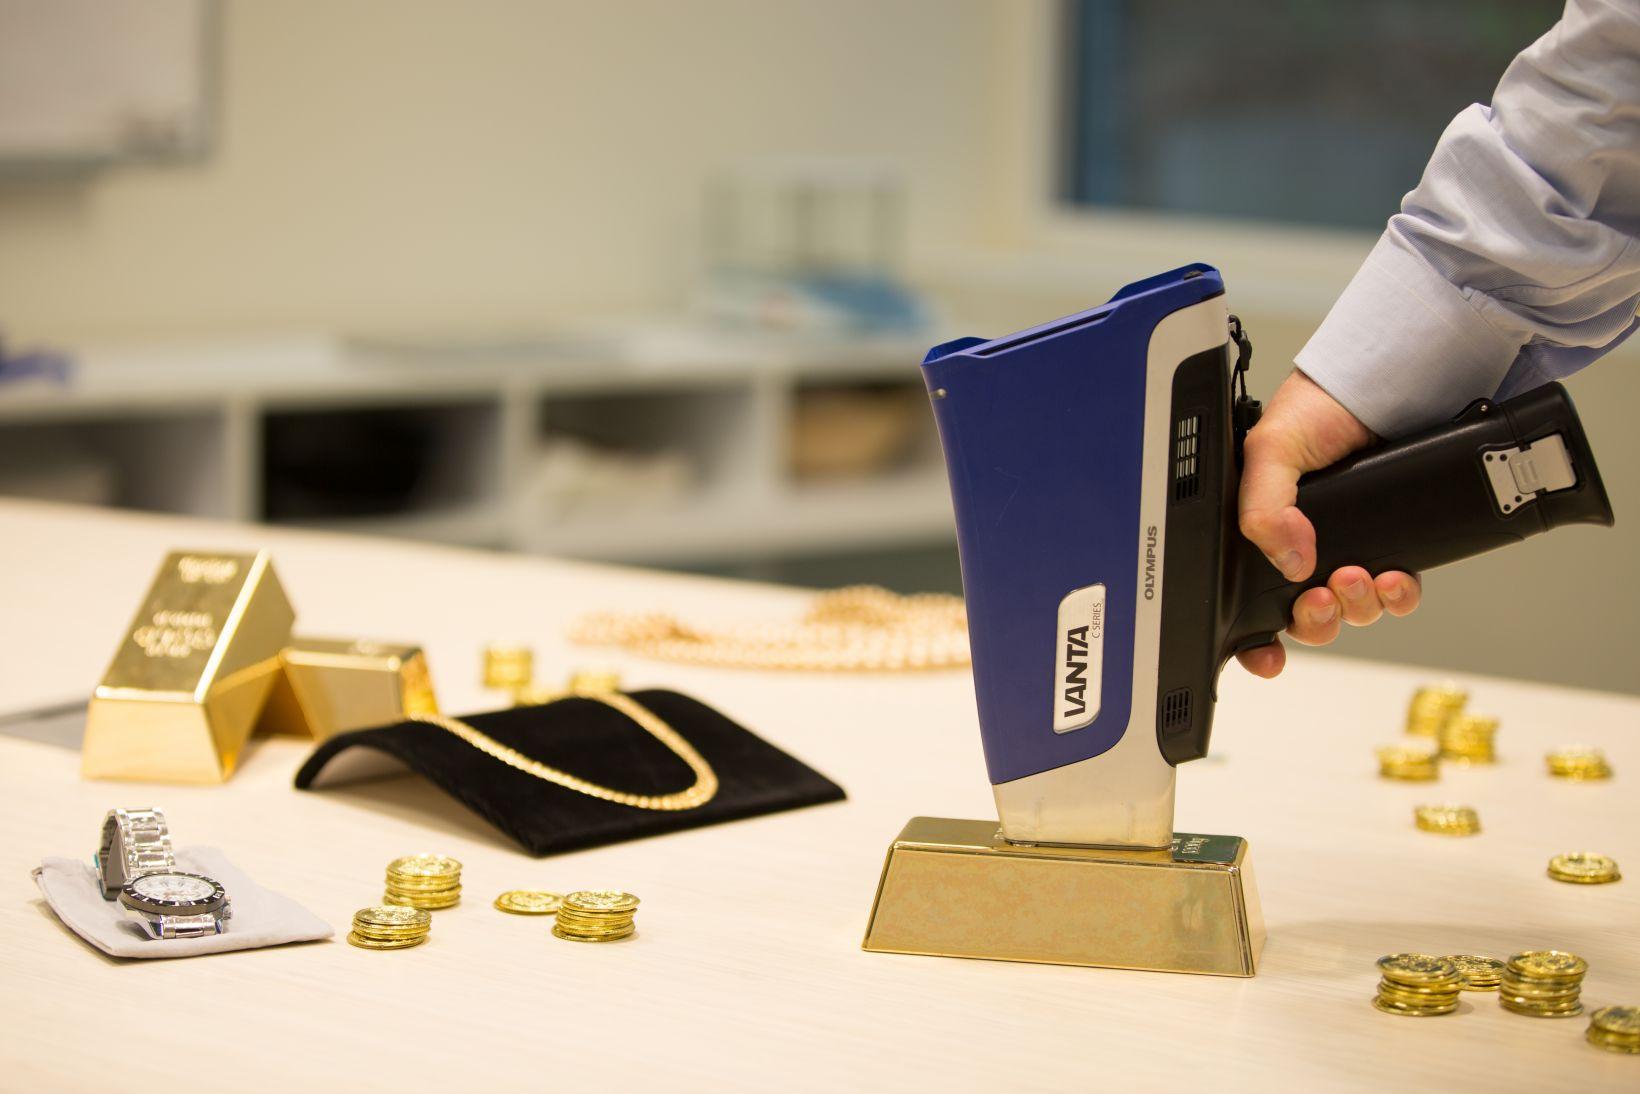 portable xrf analyzing precious metals